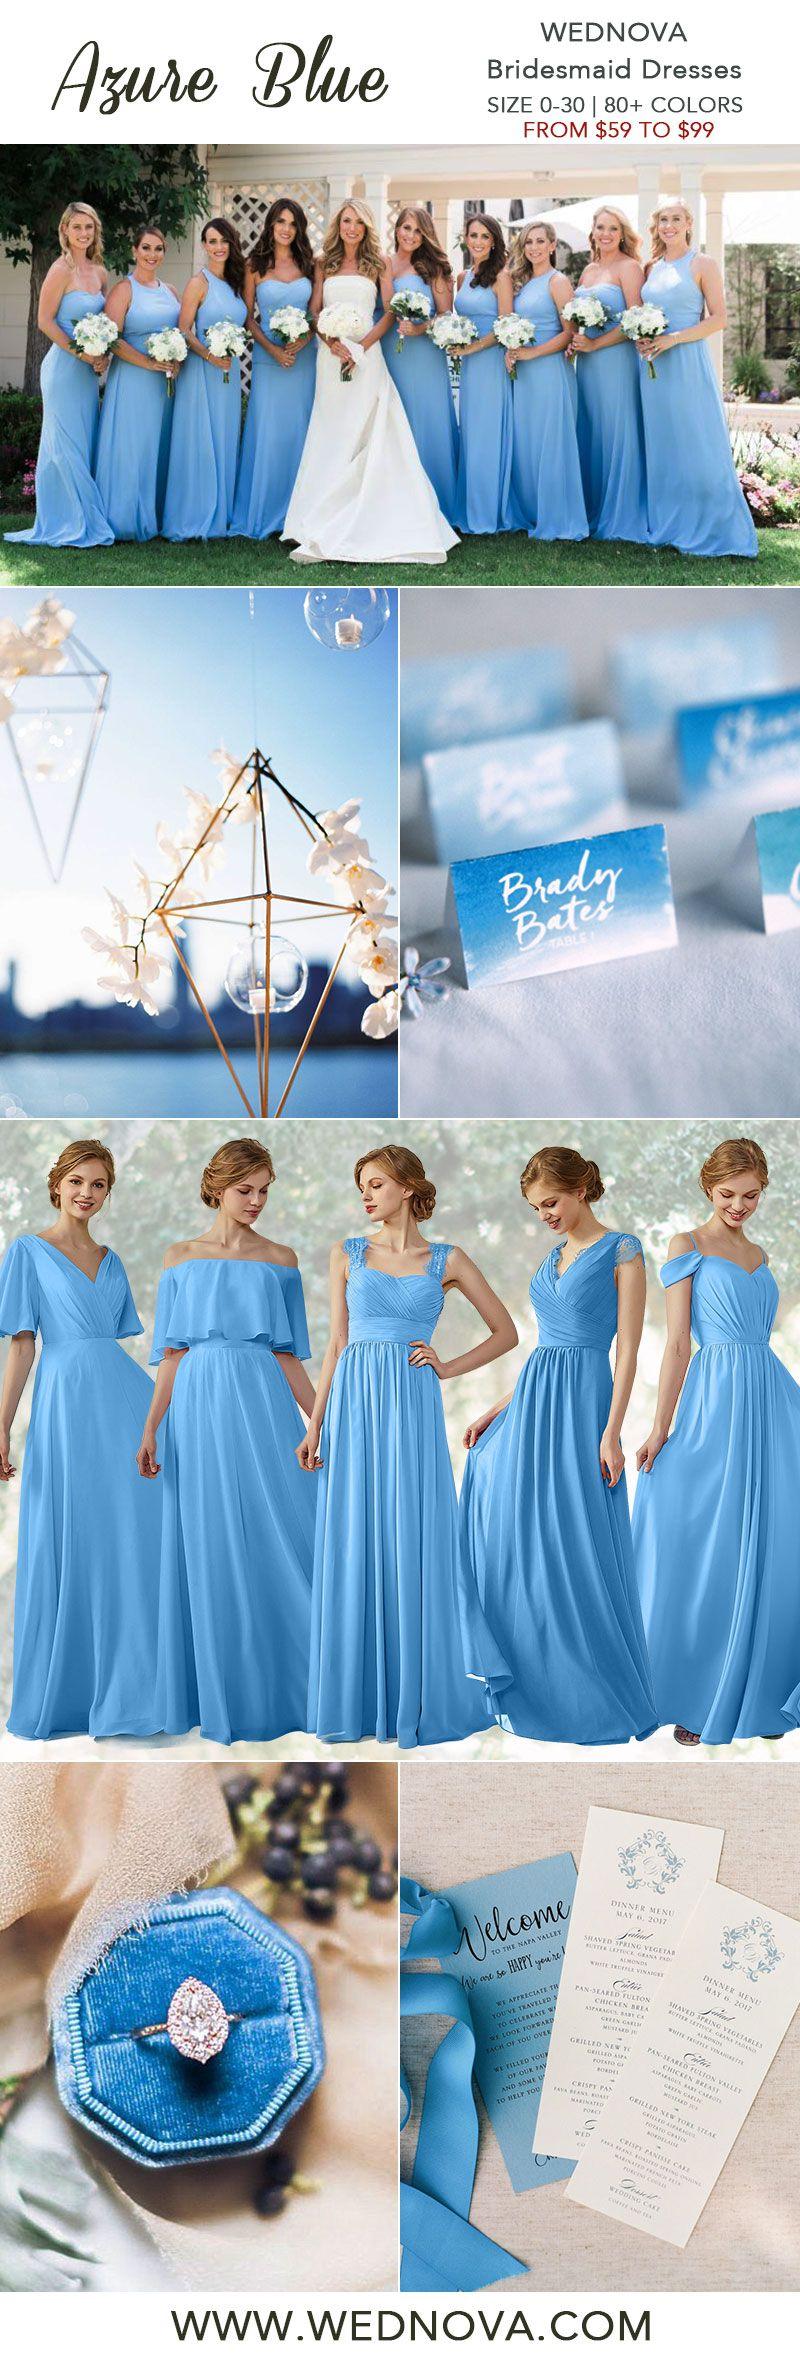 Beautiful Azure Blue Bridesmaid Dress Straps Dress High Quality All Size Cheap On Sale 201 Ocean Blue Weddings Blue Wedding Decorations Blue Bridesmaid Dresses